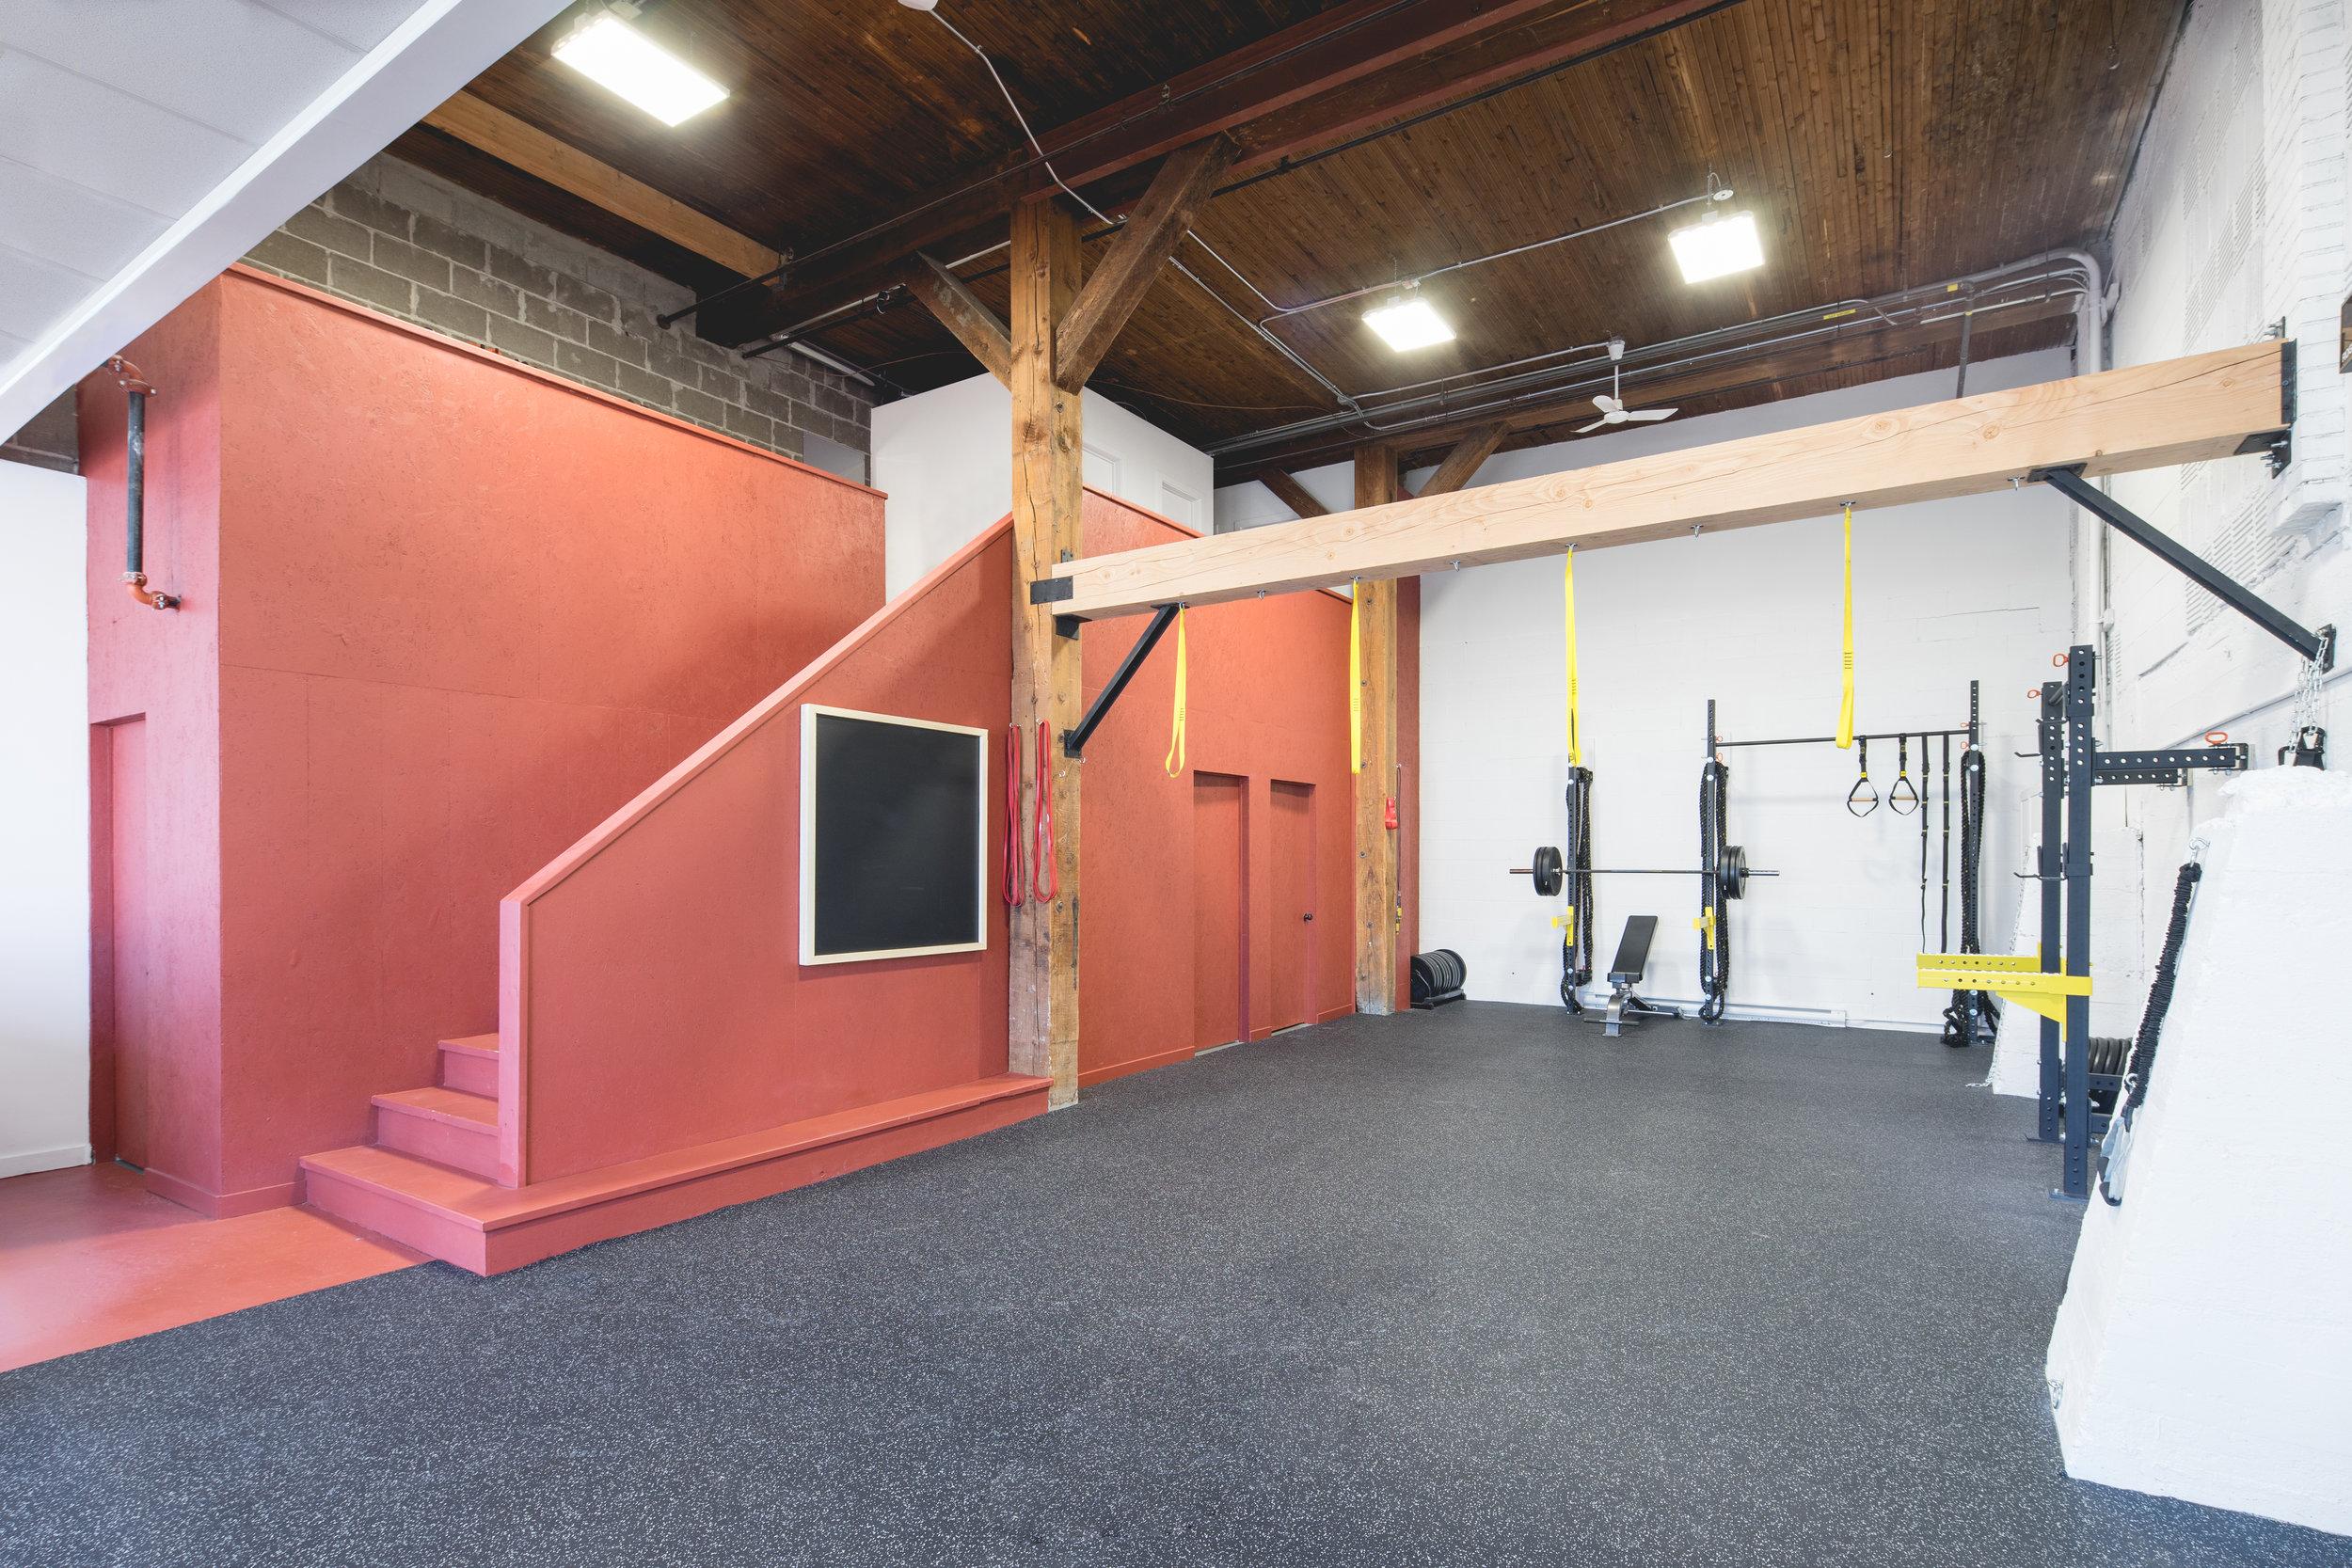 LaFitnesserie TRX CrossFit Gym